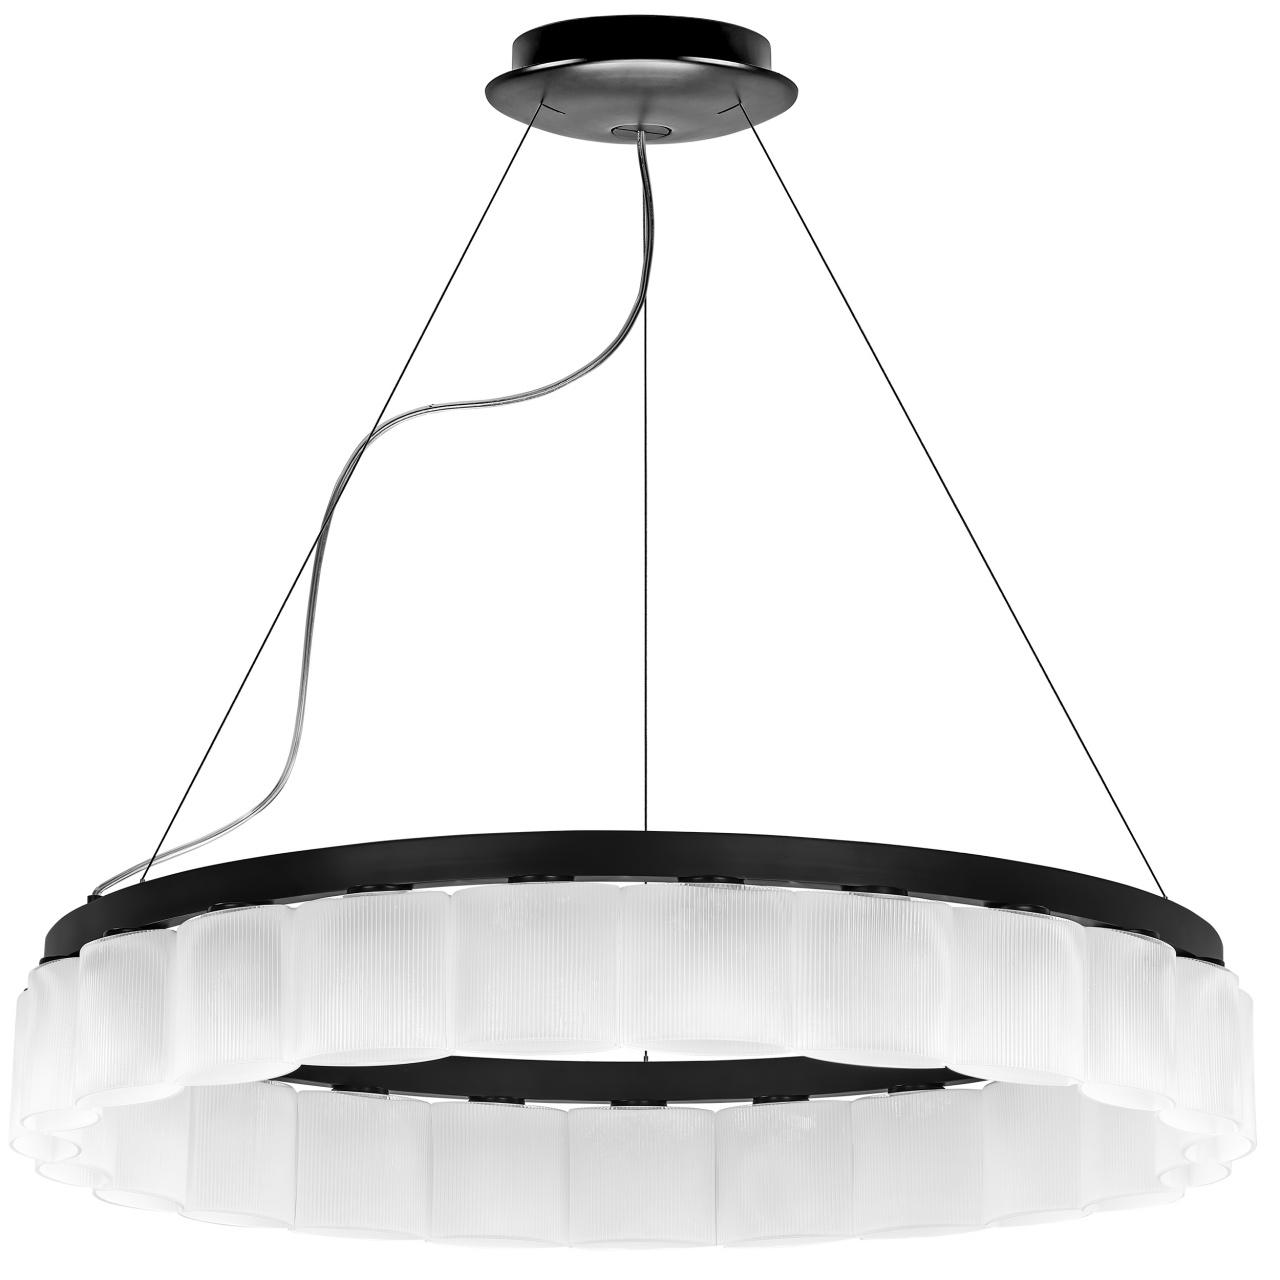 Люстра подвесная Nibbler 23х6W (Led) G9 черный / белый Lightstar 812236